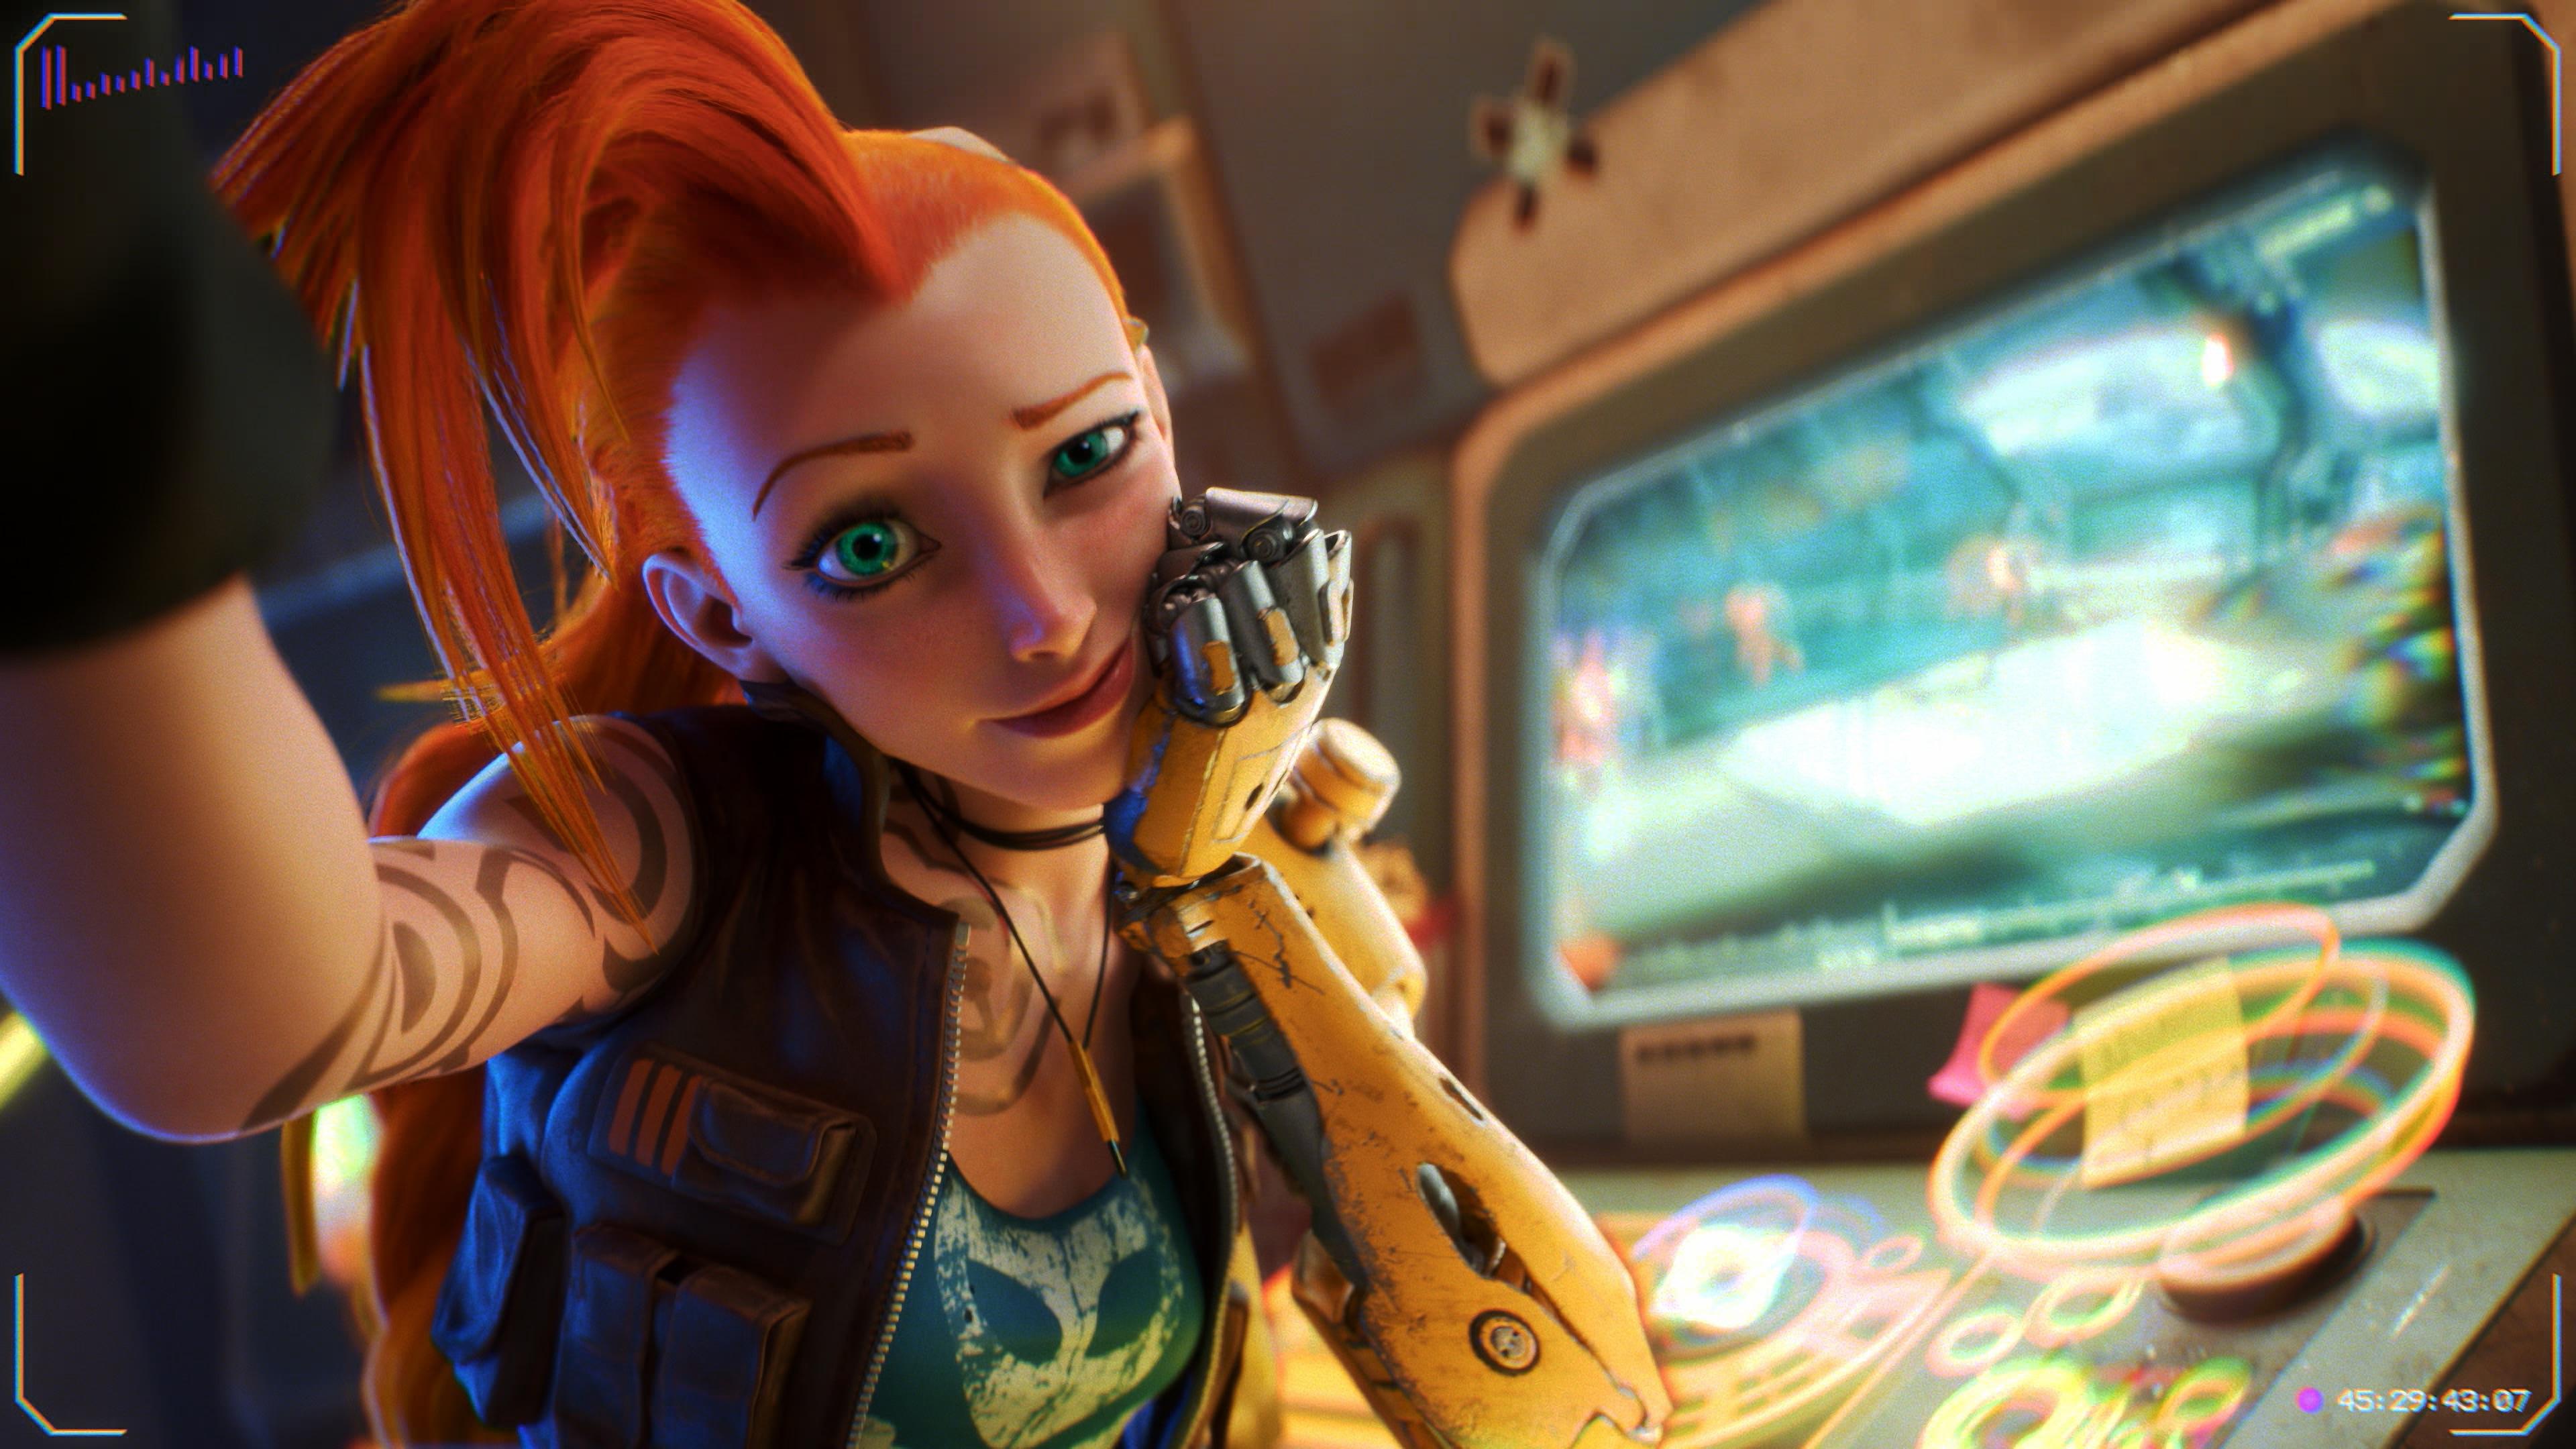 Jinx League Of Legends 4k, HD Games, 4k Wallpapers, Images